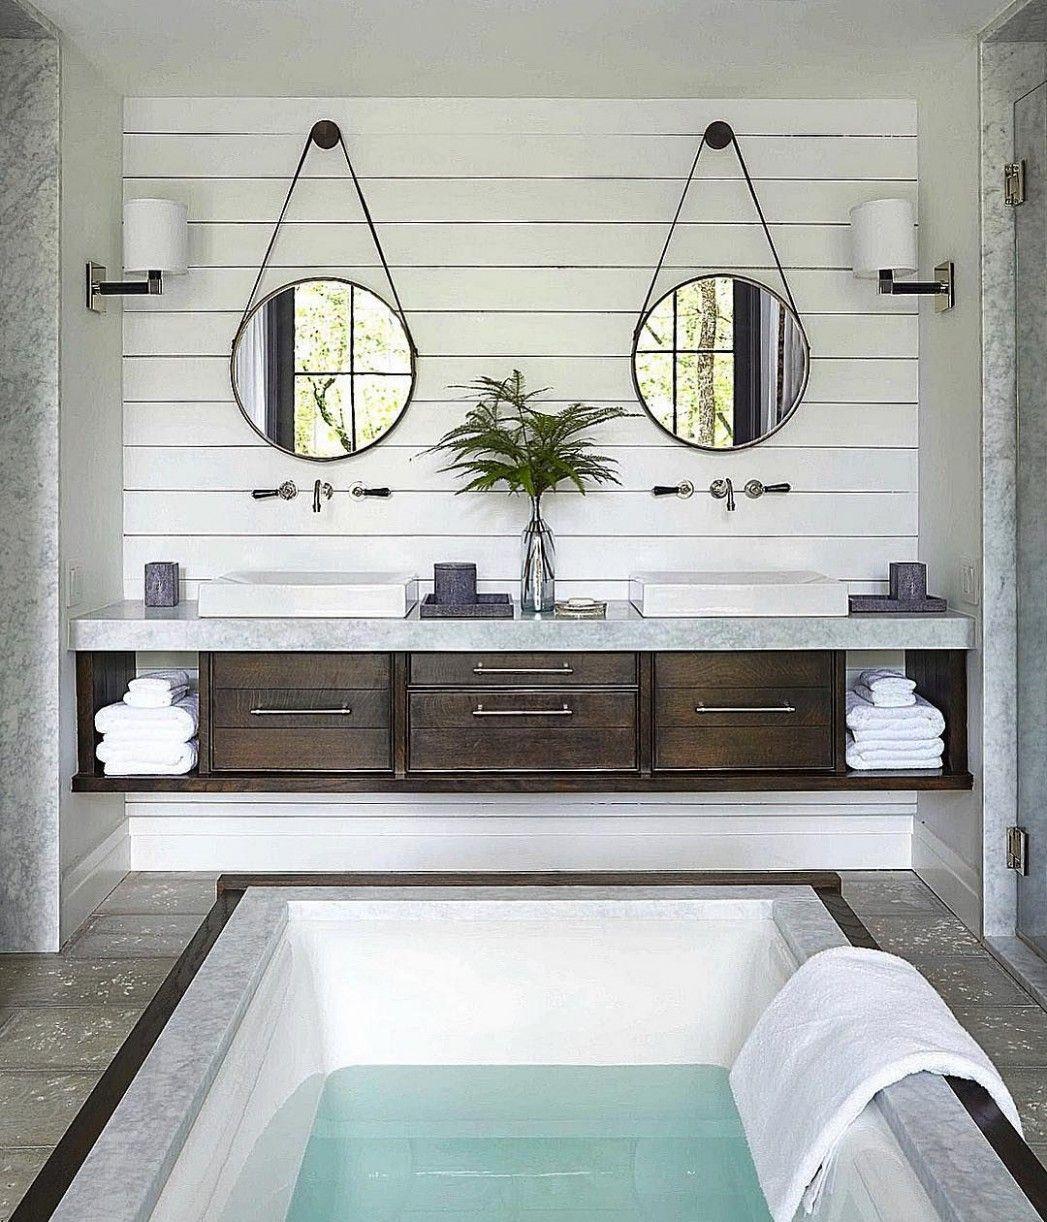 Kohler Bathroom Design Software di 2020